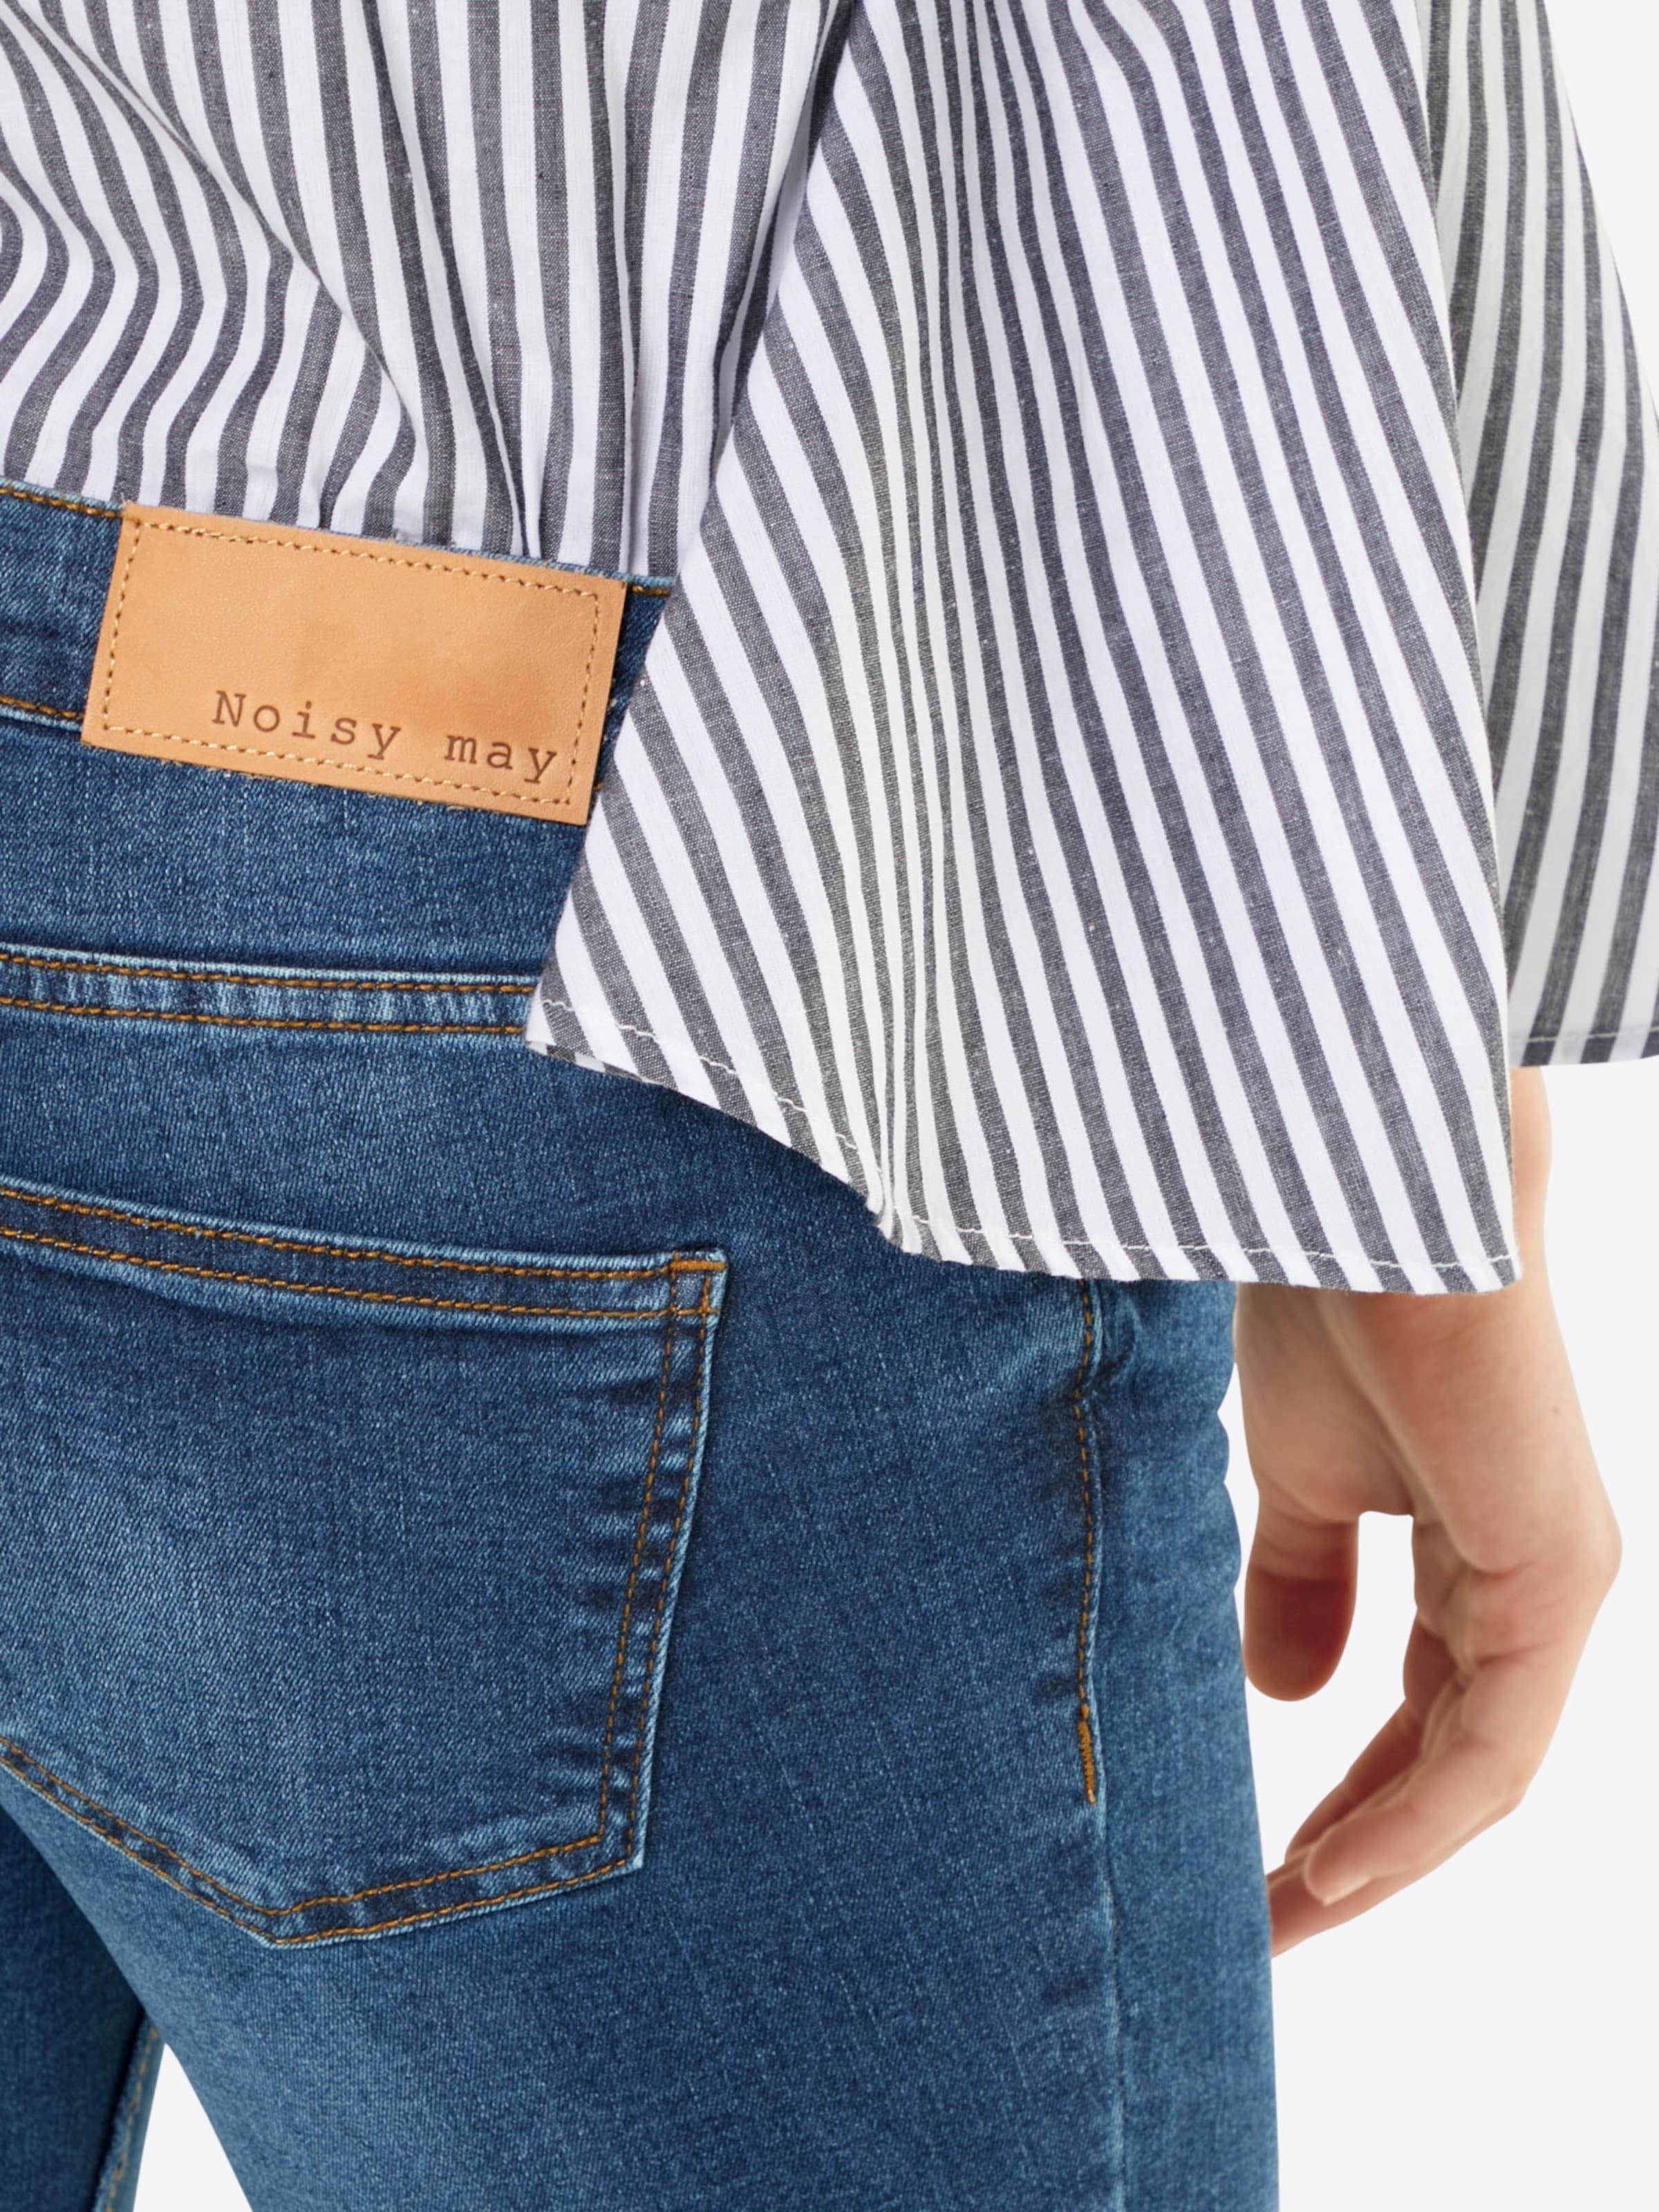 Noisy may Skinny Jeans 'EVE' Rabatt Sneakernews Billig Verkauf Neue Stile kphe2